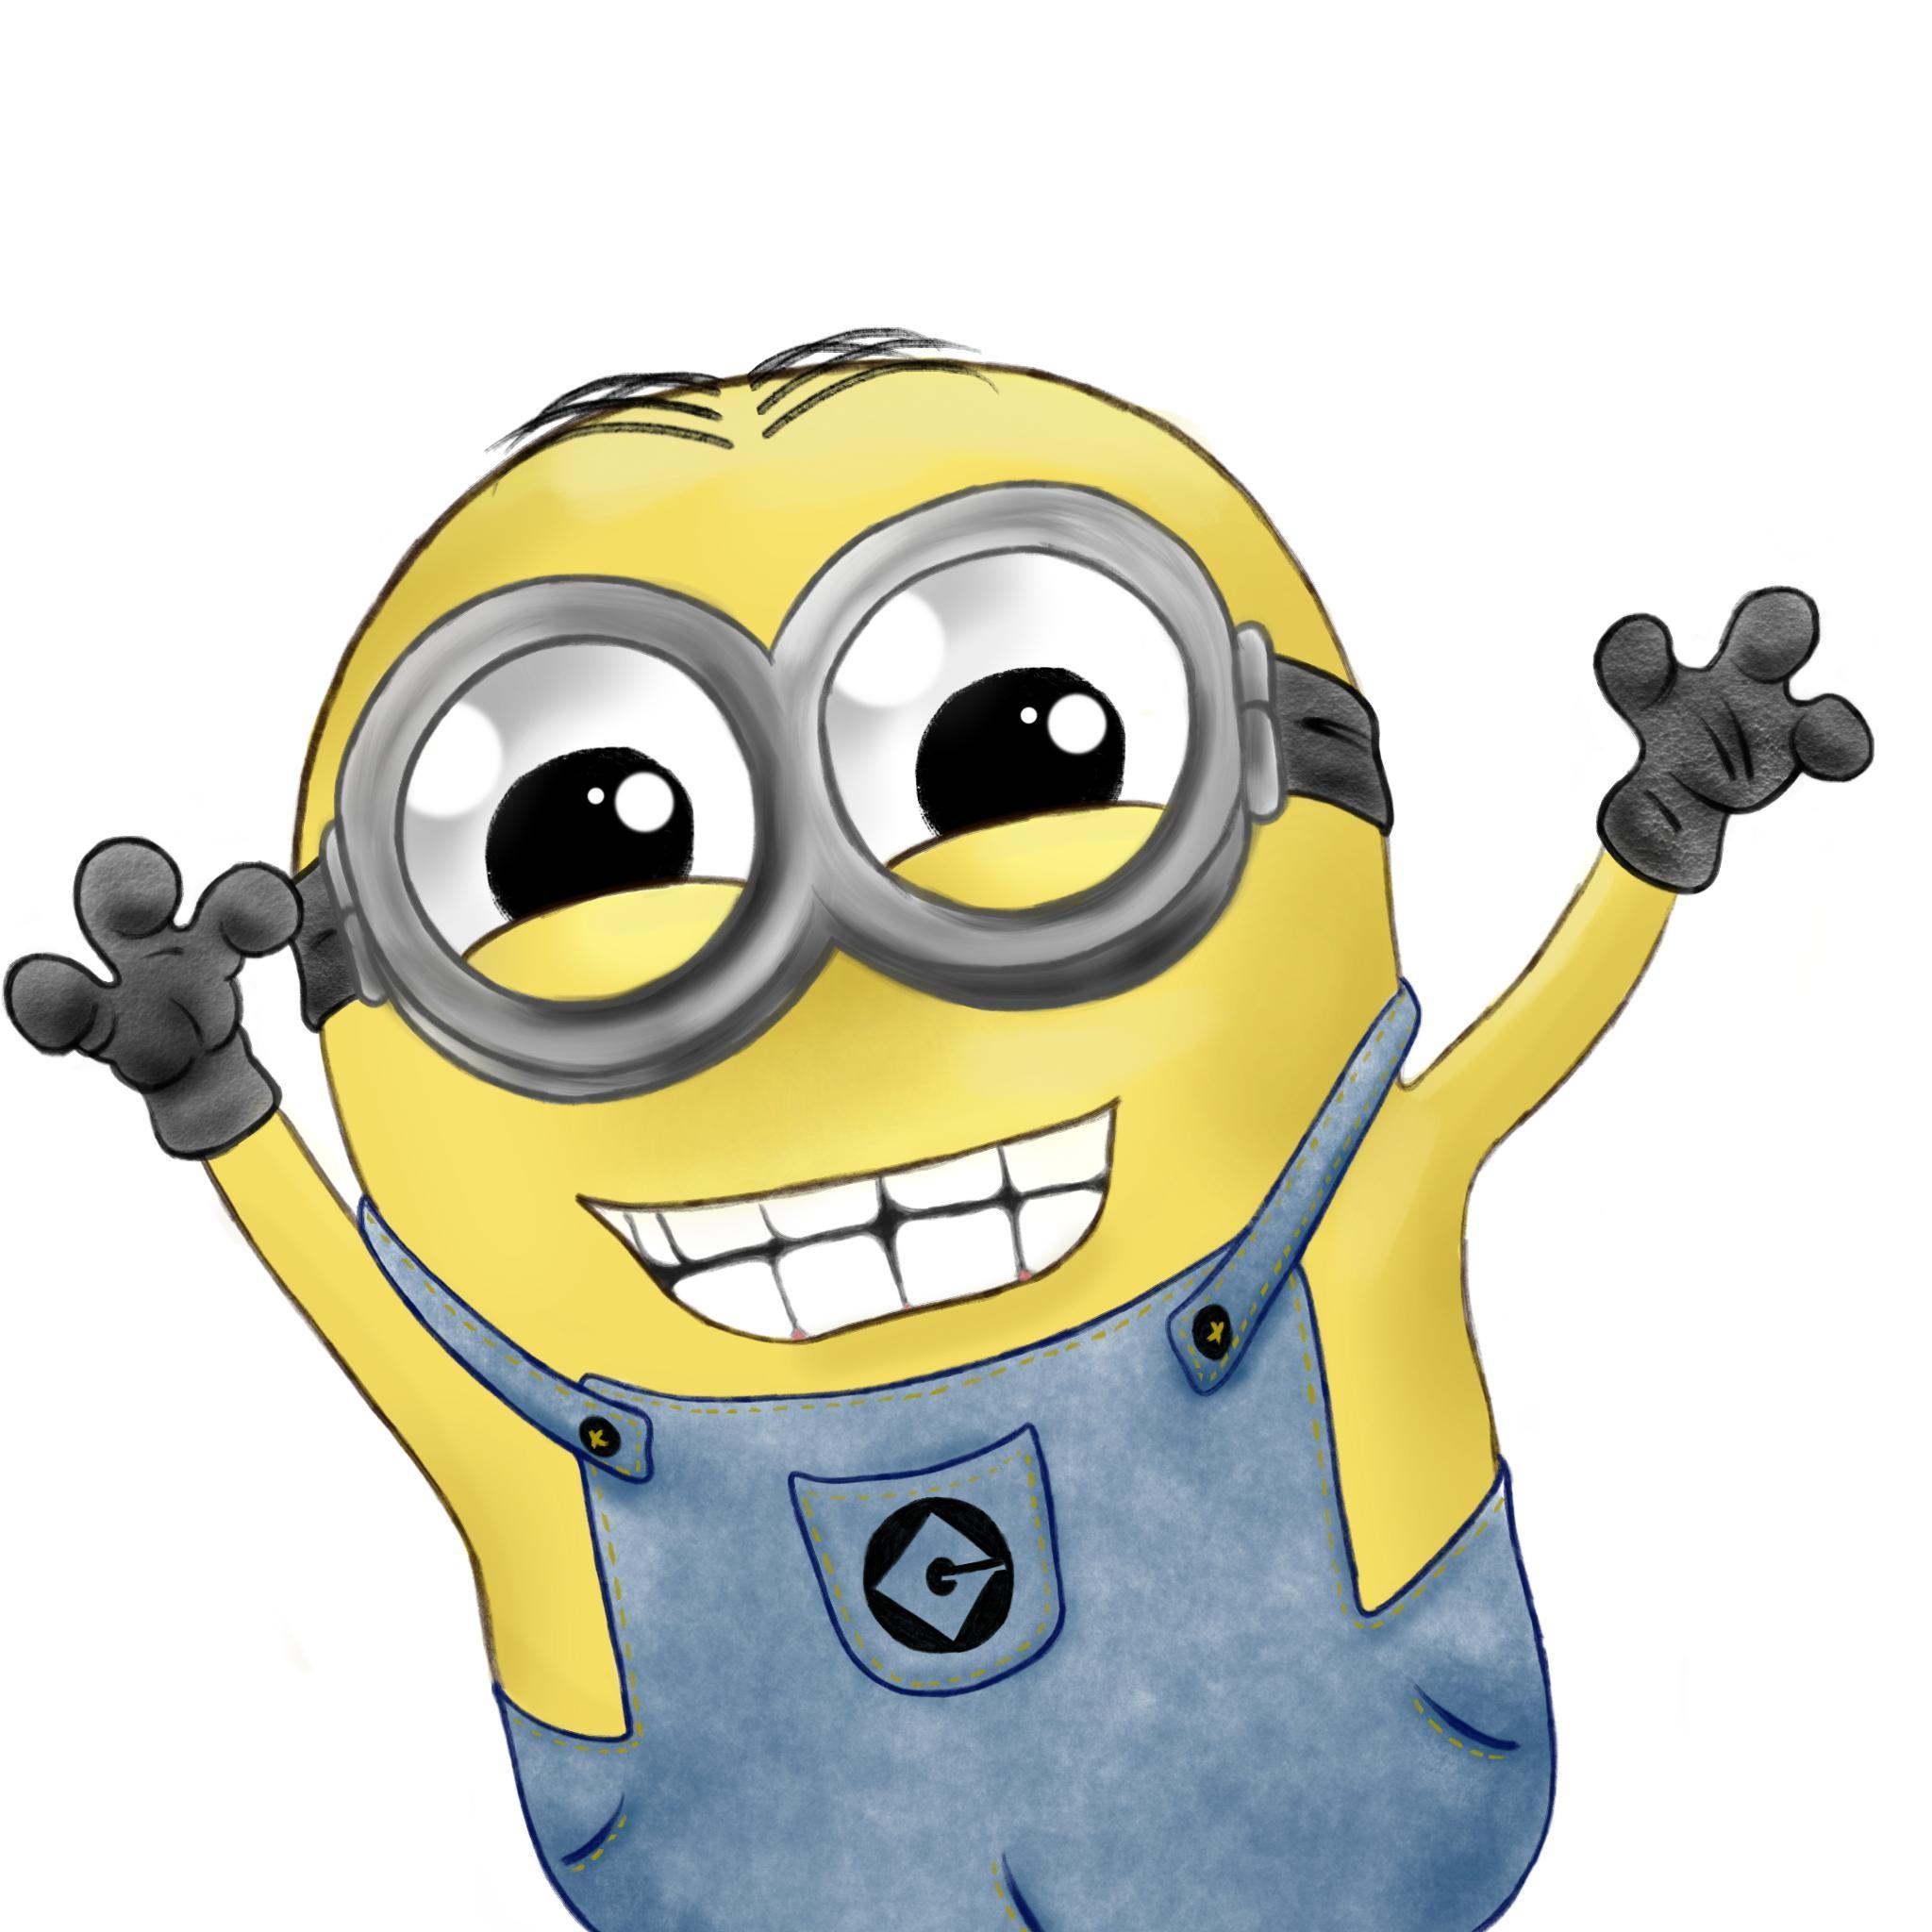 Minion, Ipad, Wallpaper, Hd Affffdacbfacb Raw, Funny, Yellow, Wallpaper,